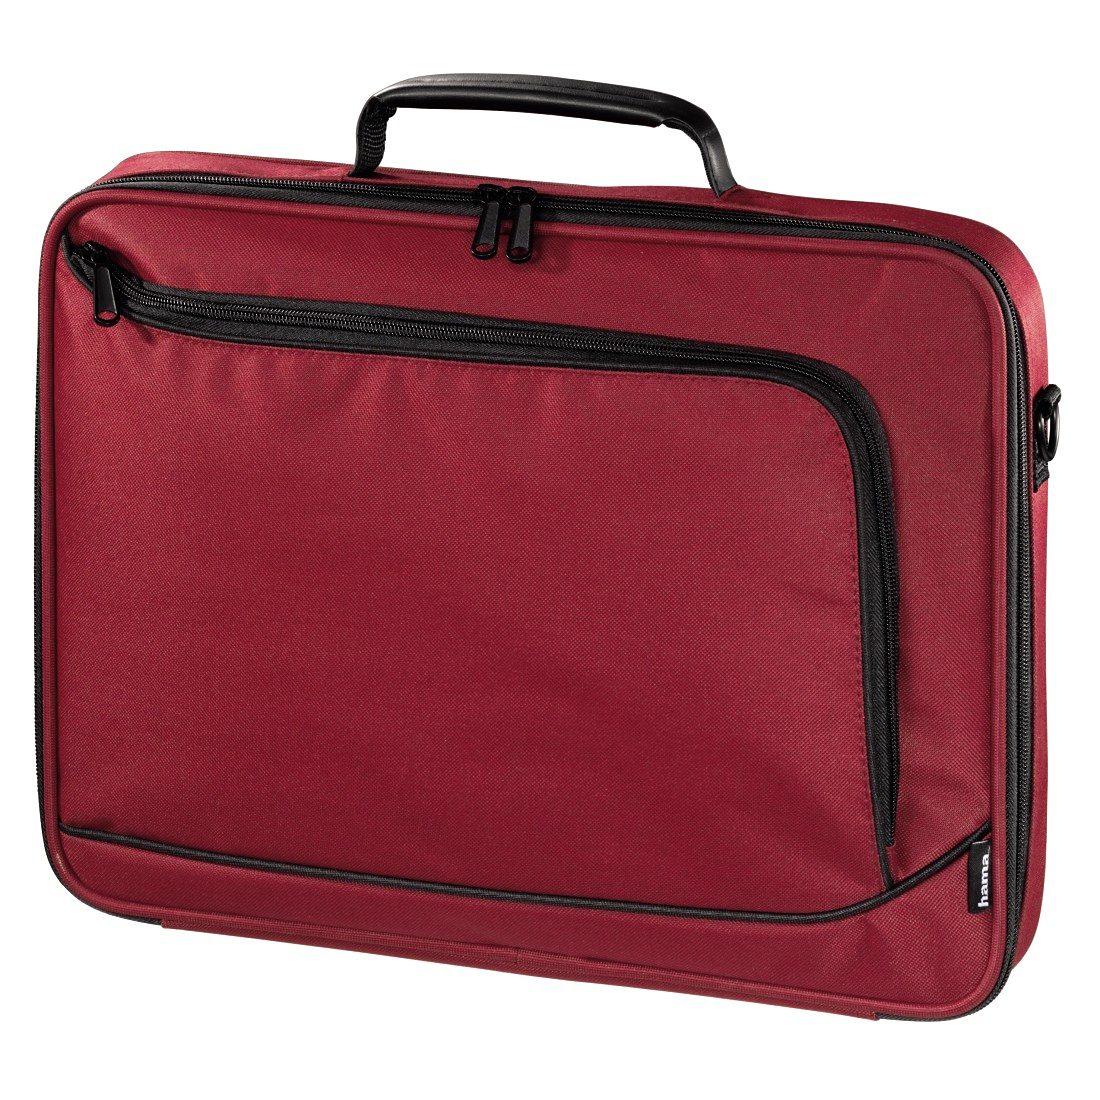 Hama Notebook-Tasche Sportsline Bordeaux, bis 44 cm (17,3), Rot